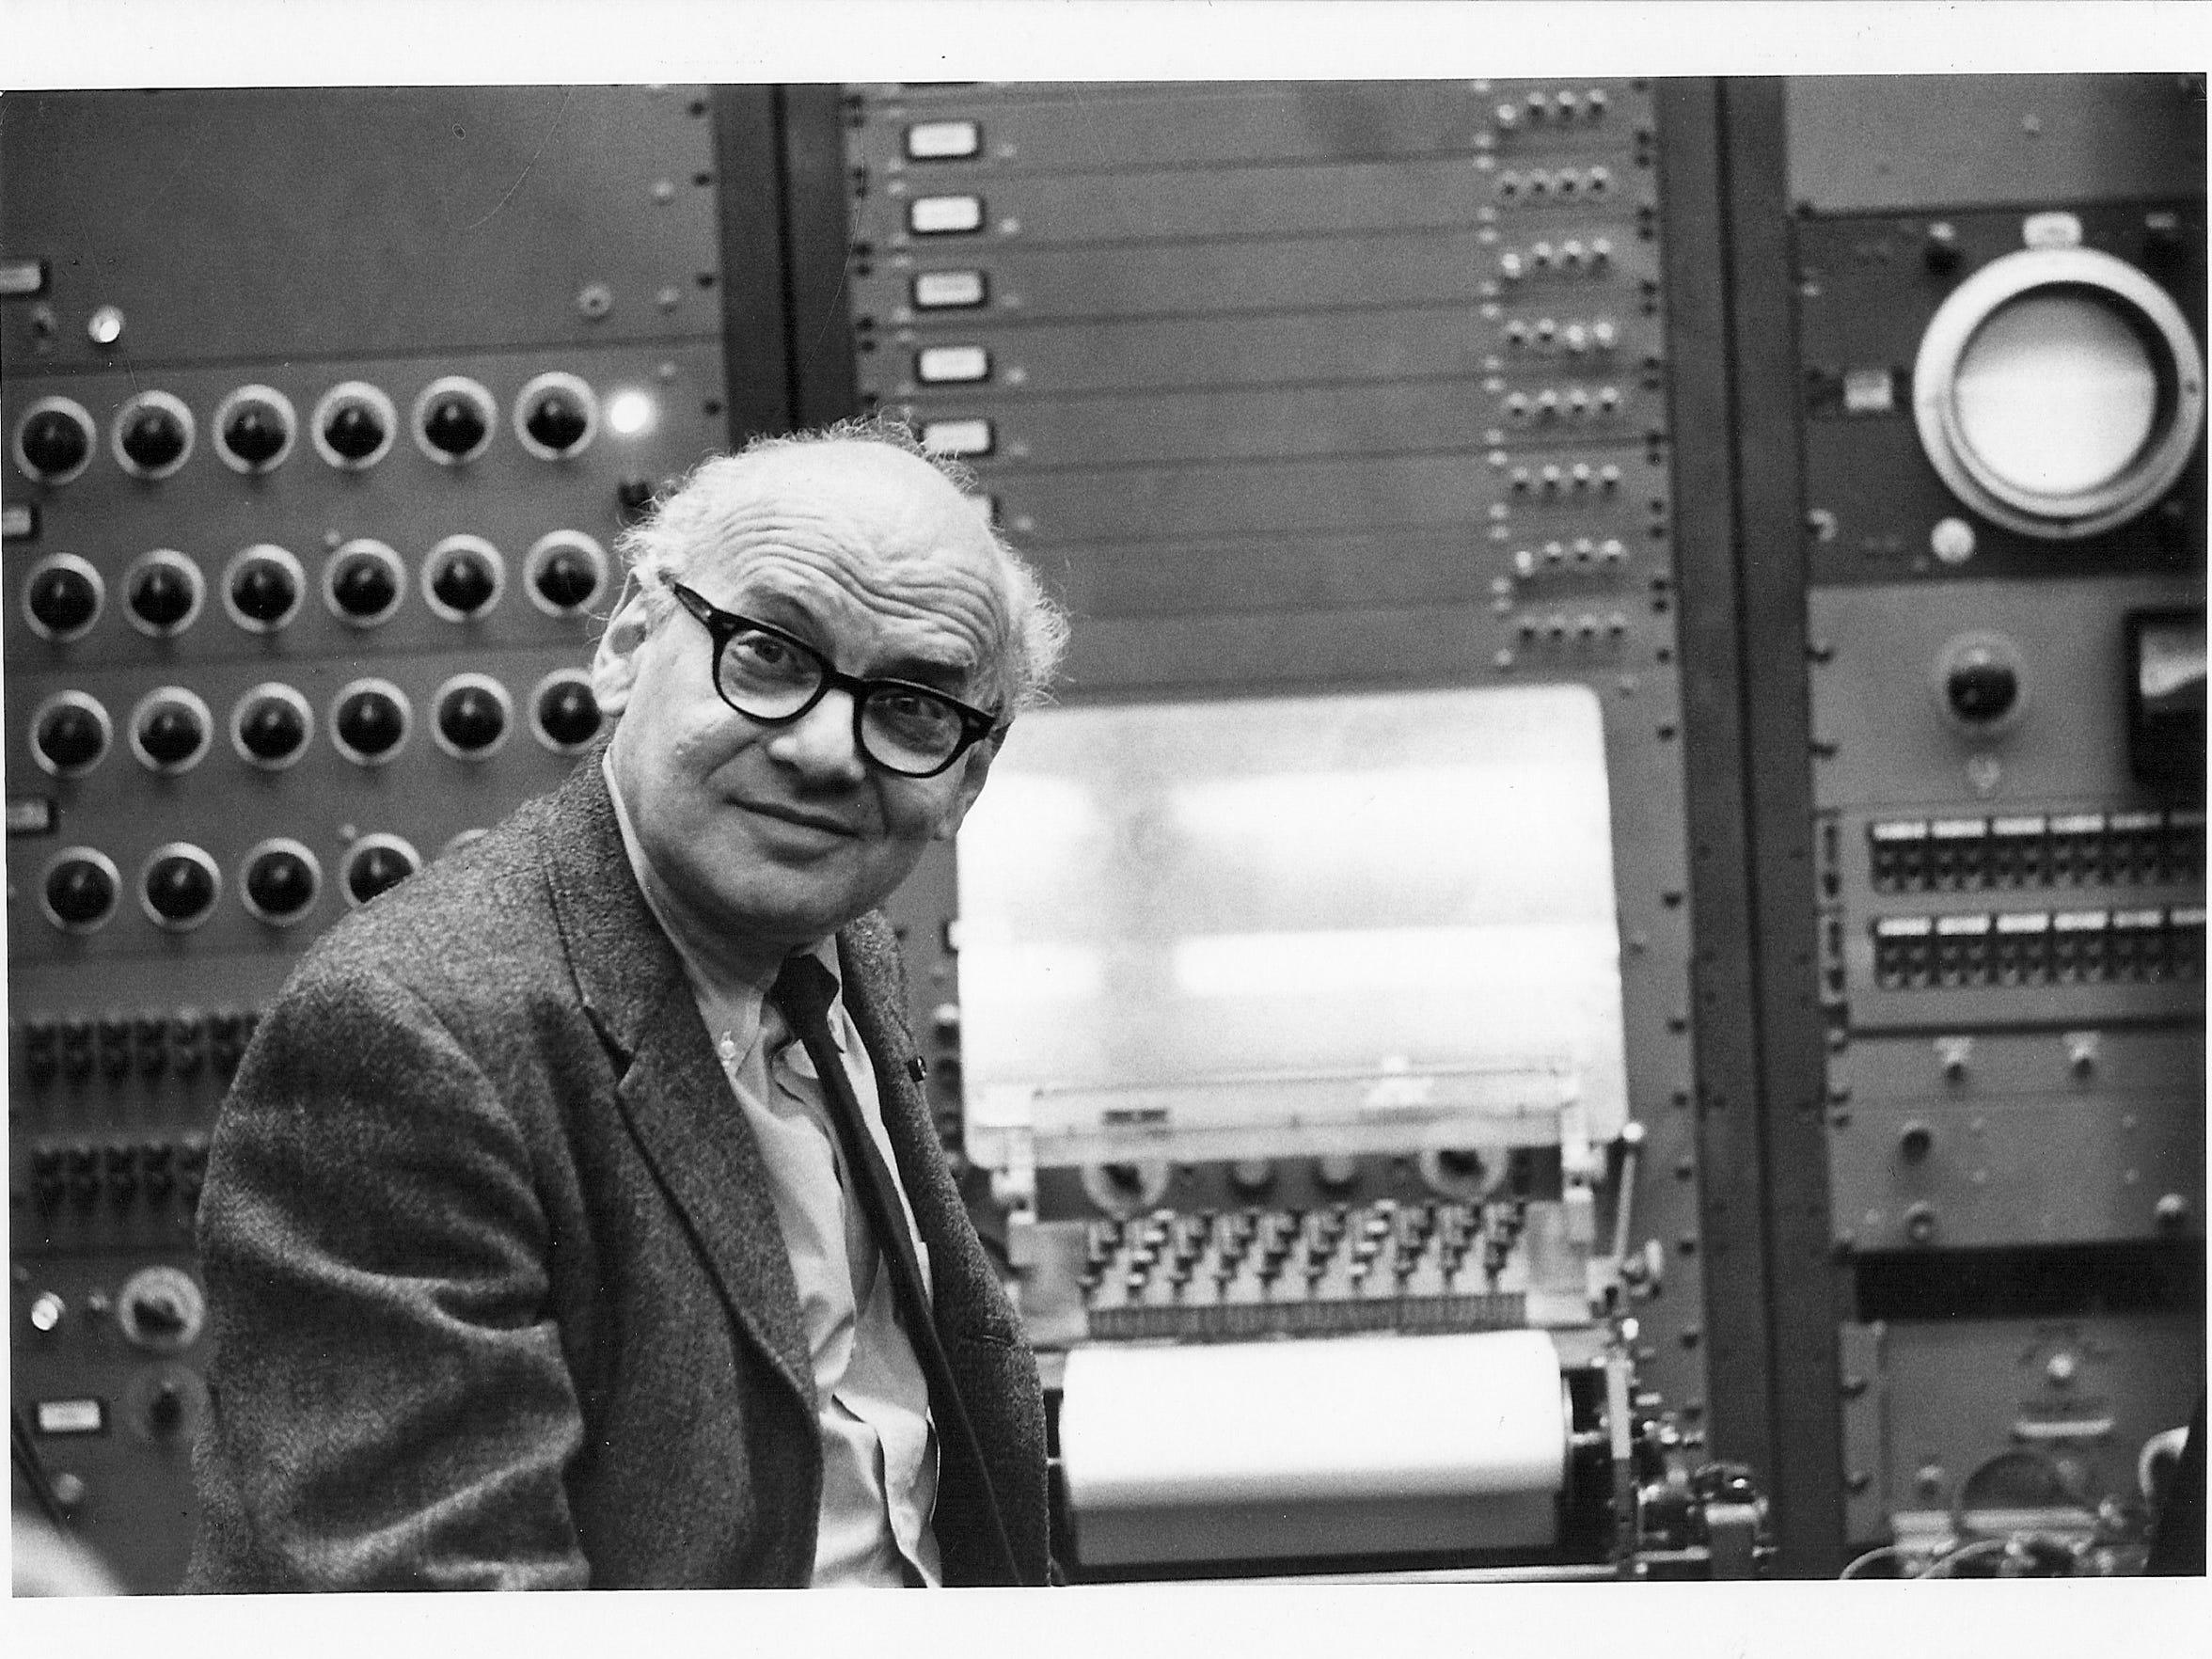 Milton Babbitt and the RCA Mark II Syntheszier.